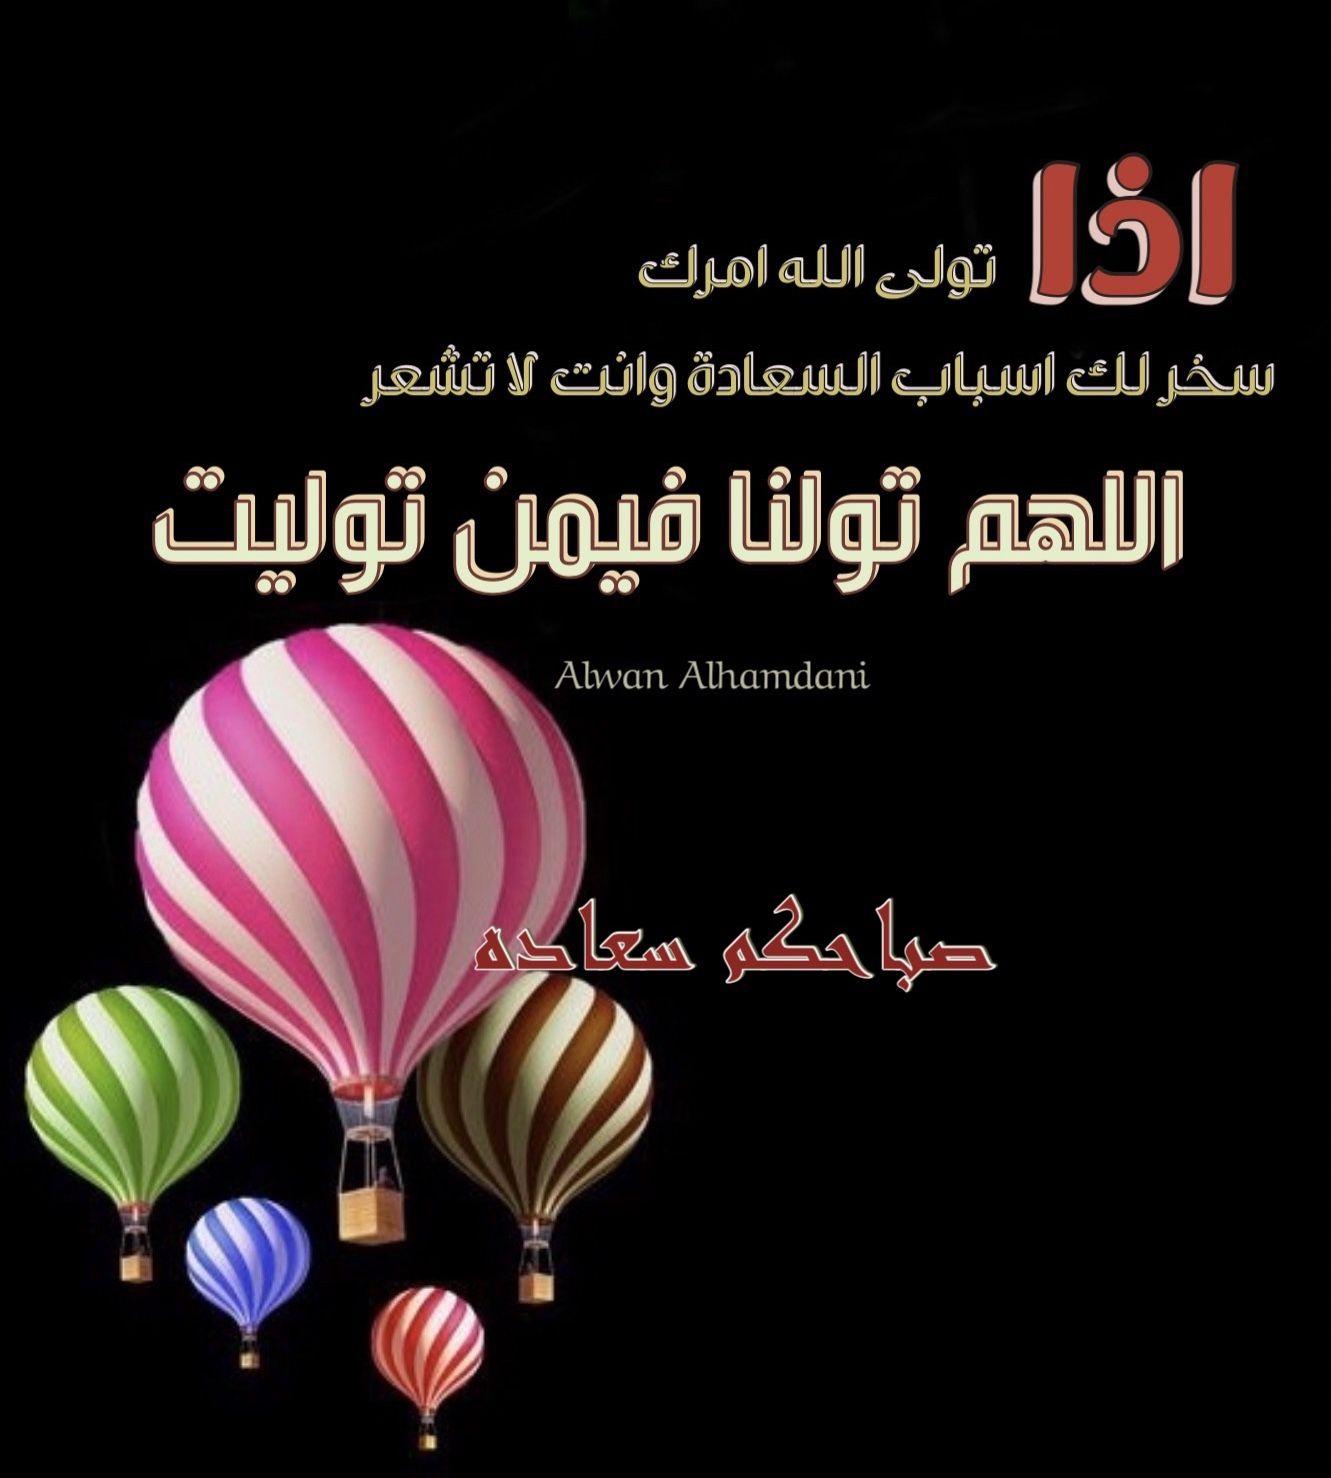 Pin By Alwan Alhamdani On صباح الخير Morning Messages Good Morning Images Morning Images